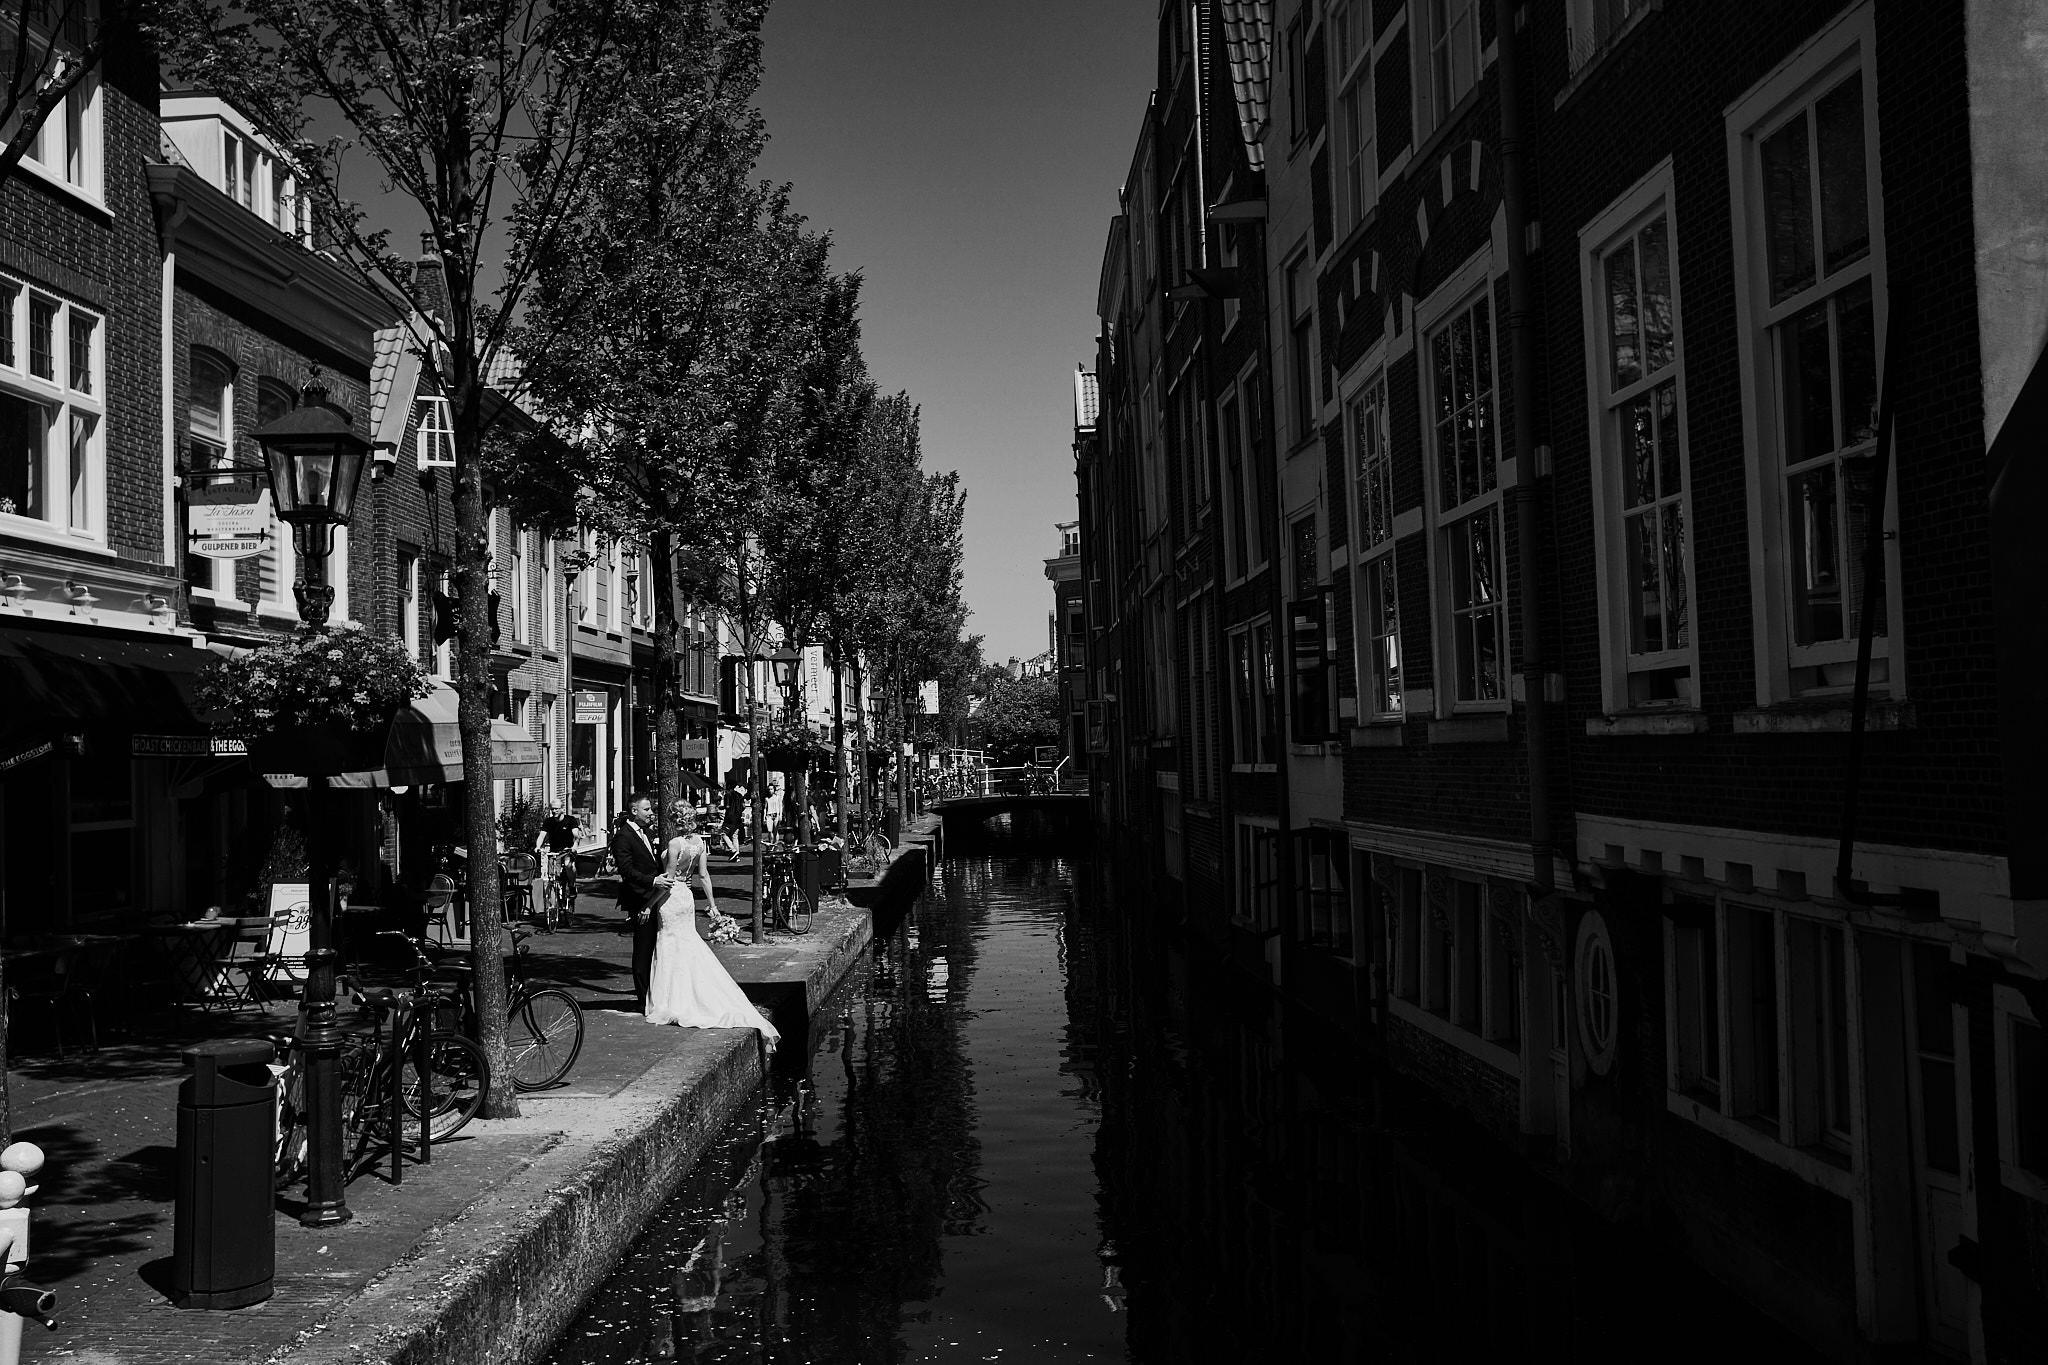 bruidsfotografie-trouwreportage-Delft-Ingrid-Richard_1432.jpg